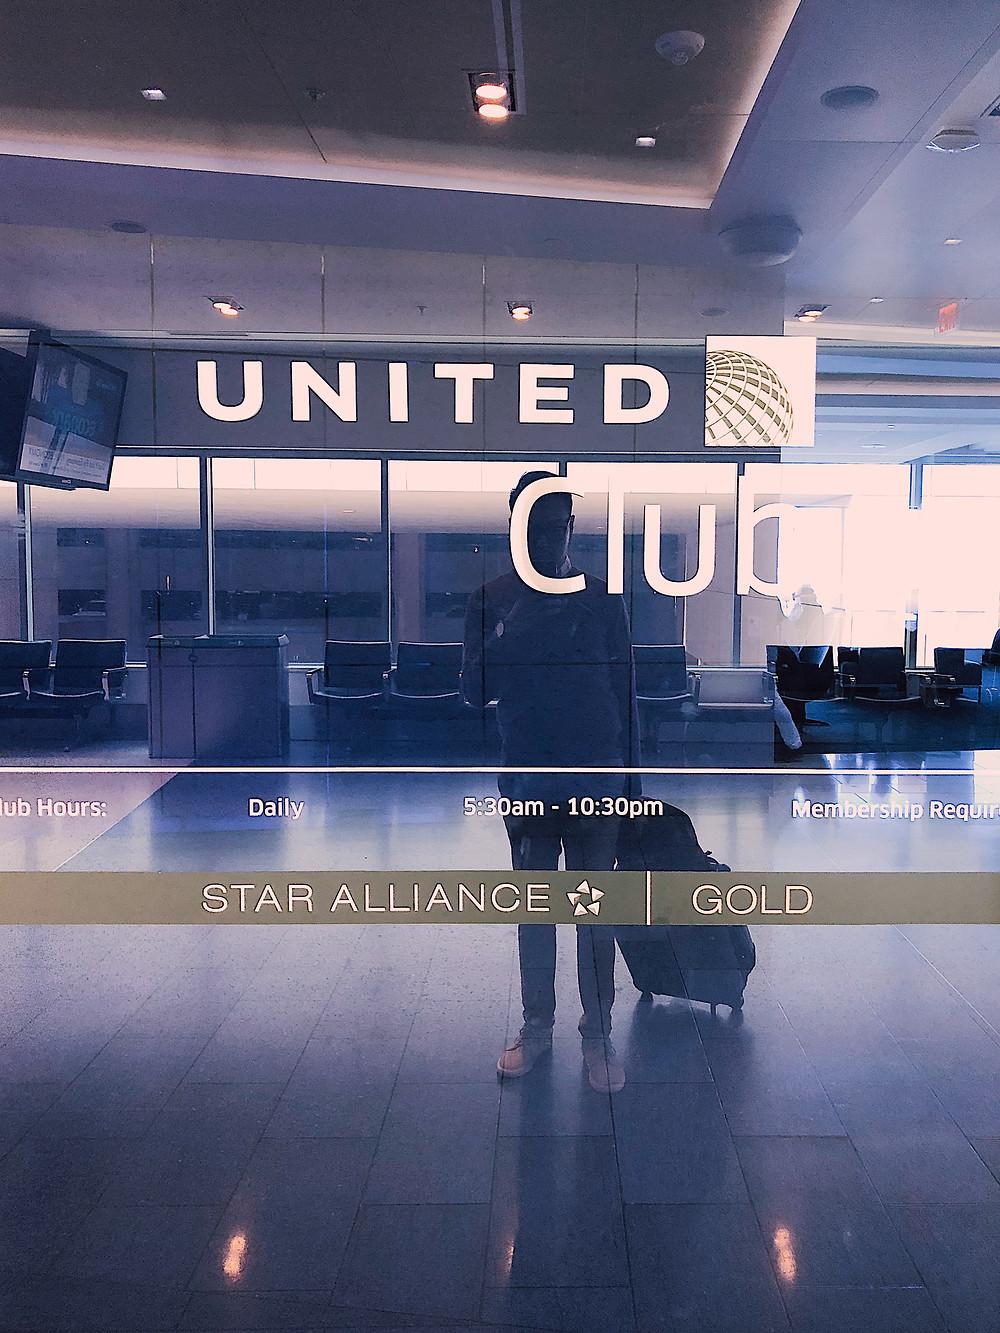 United Club, George Bush Intercontinental Airport (IAH)